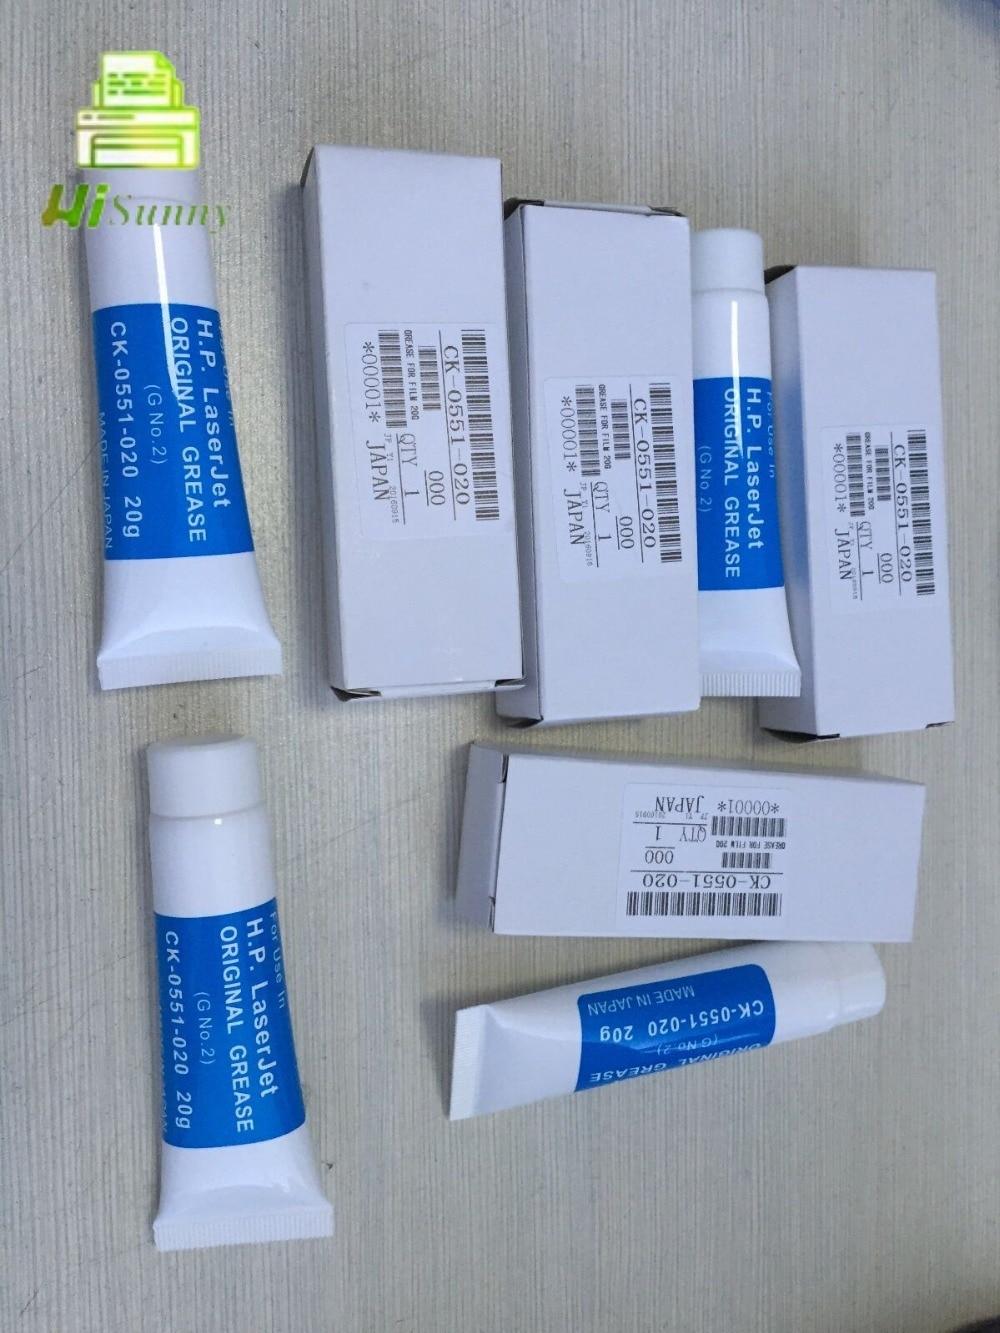 4 шт CK-0551-020 для HP 4015 4014 600 601 602 фузер пленка рукав смазка